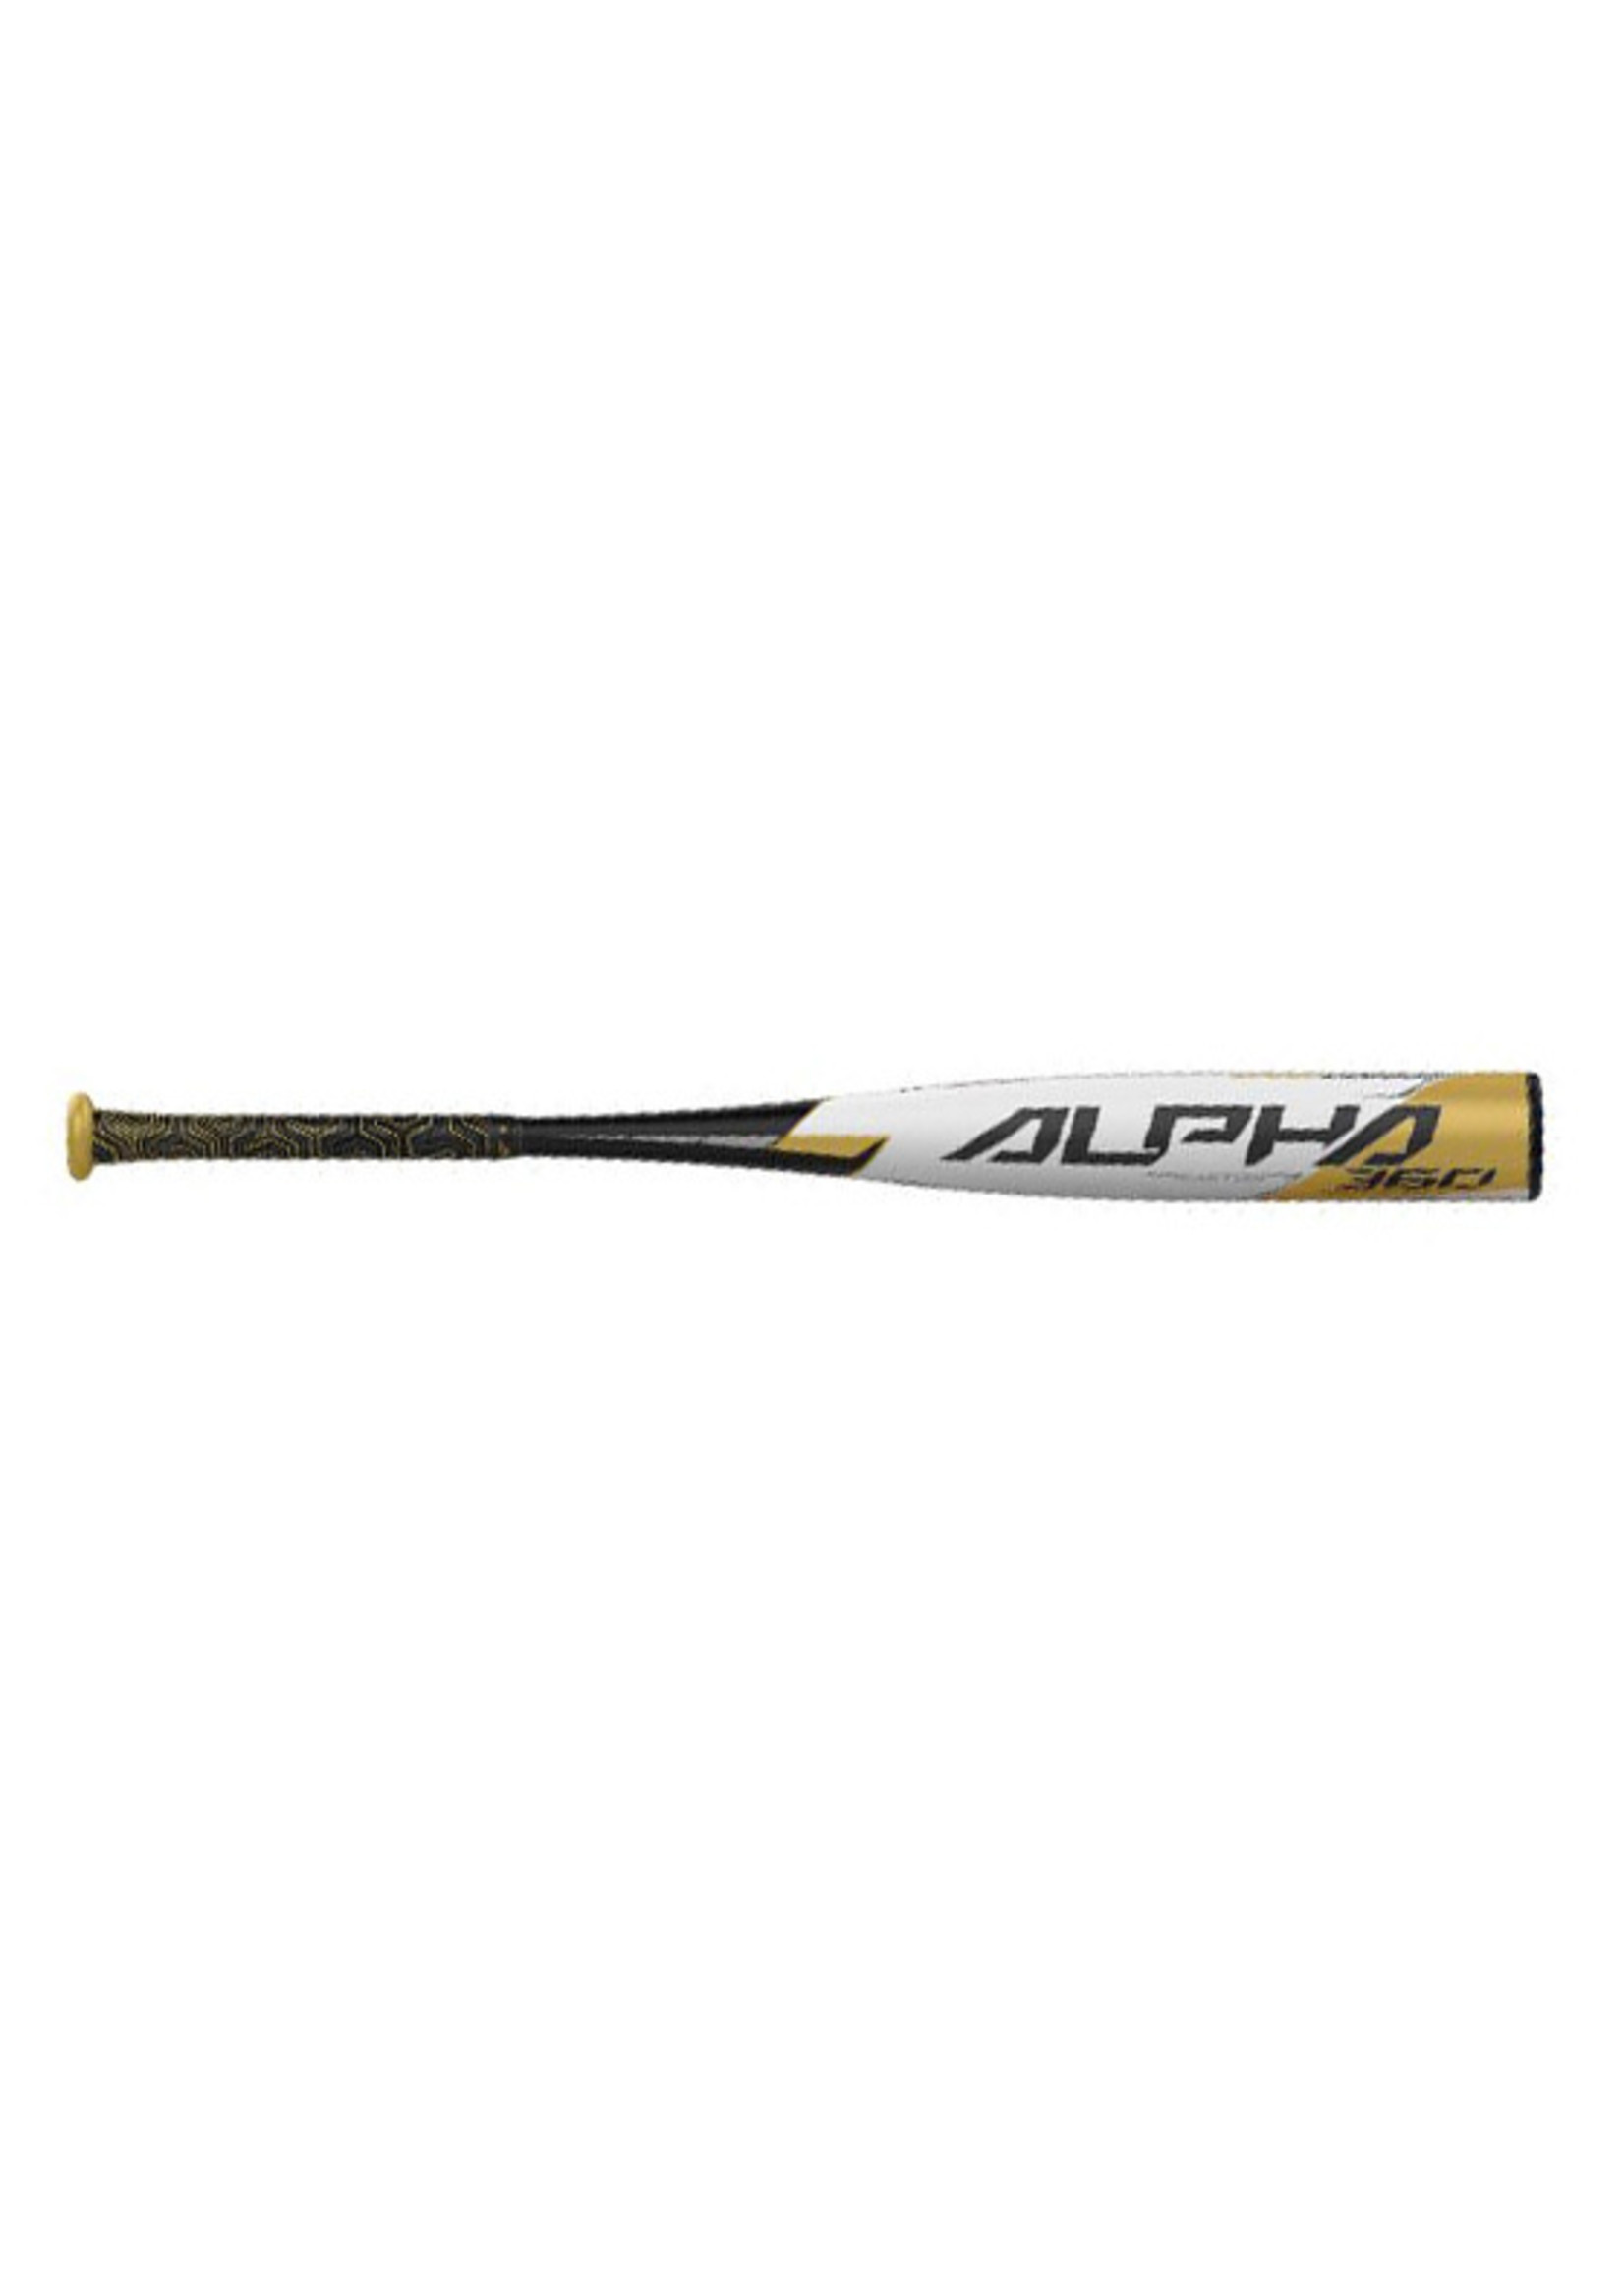 Easton Baseball (Canada) EASTON ALPHA 360 2 3/4 (-8) BATON DE BASEBALL